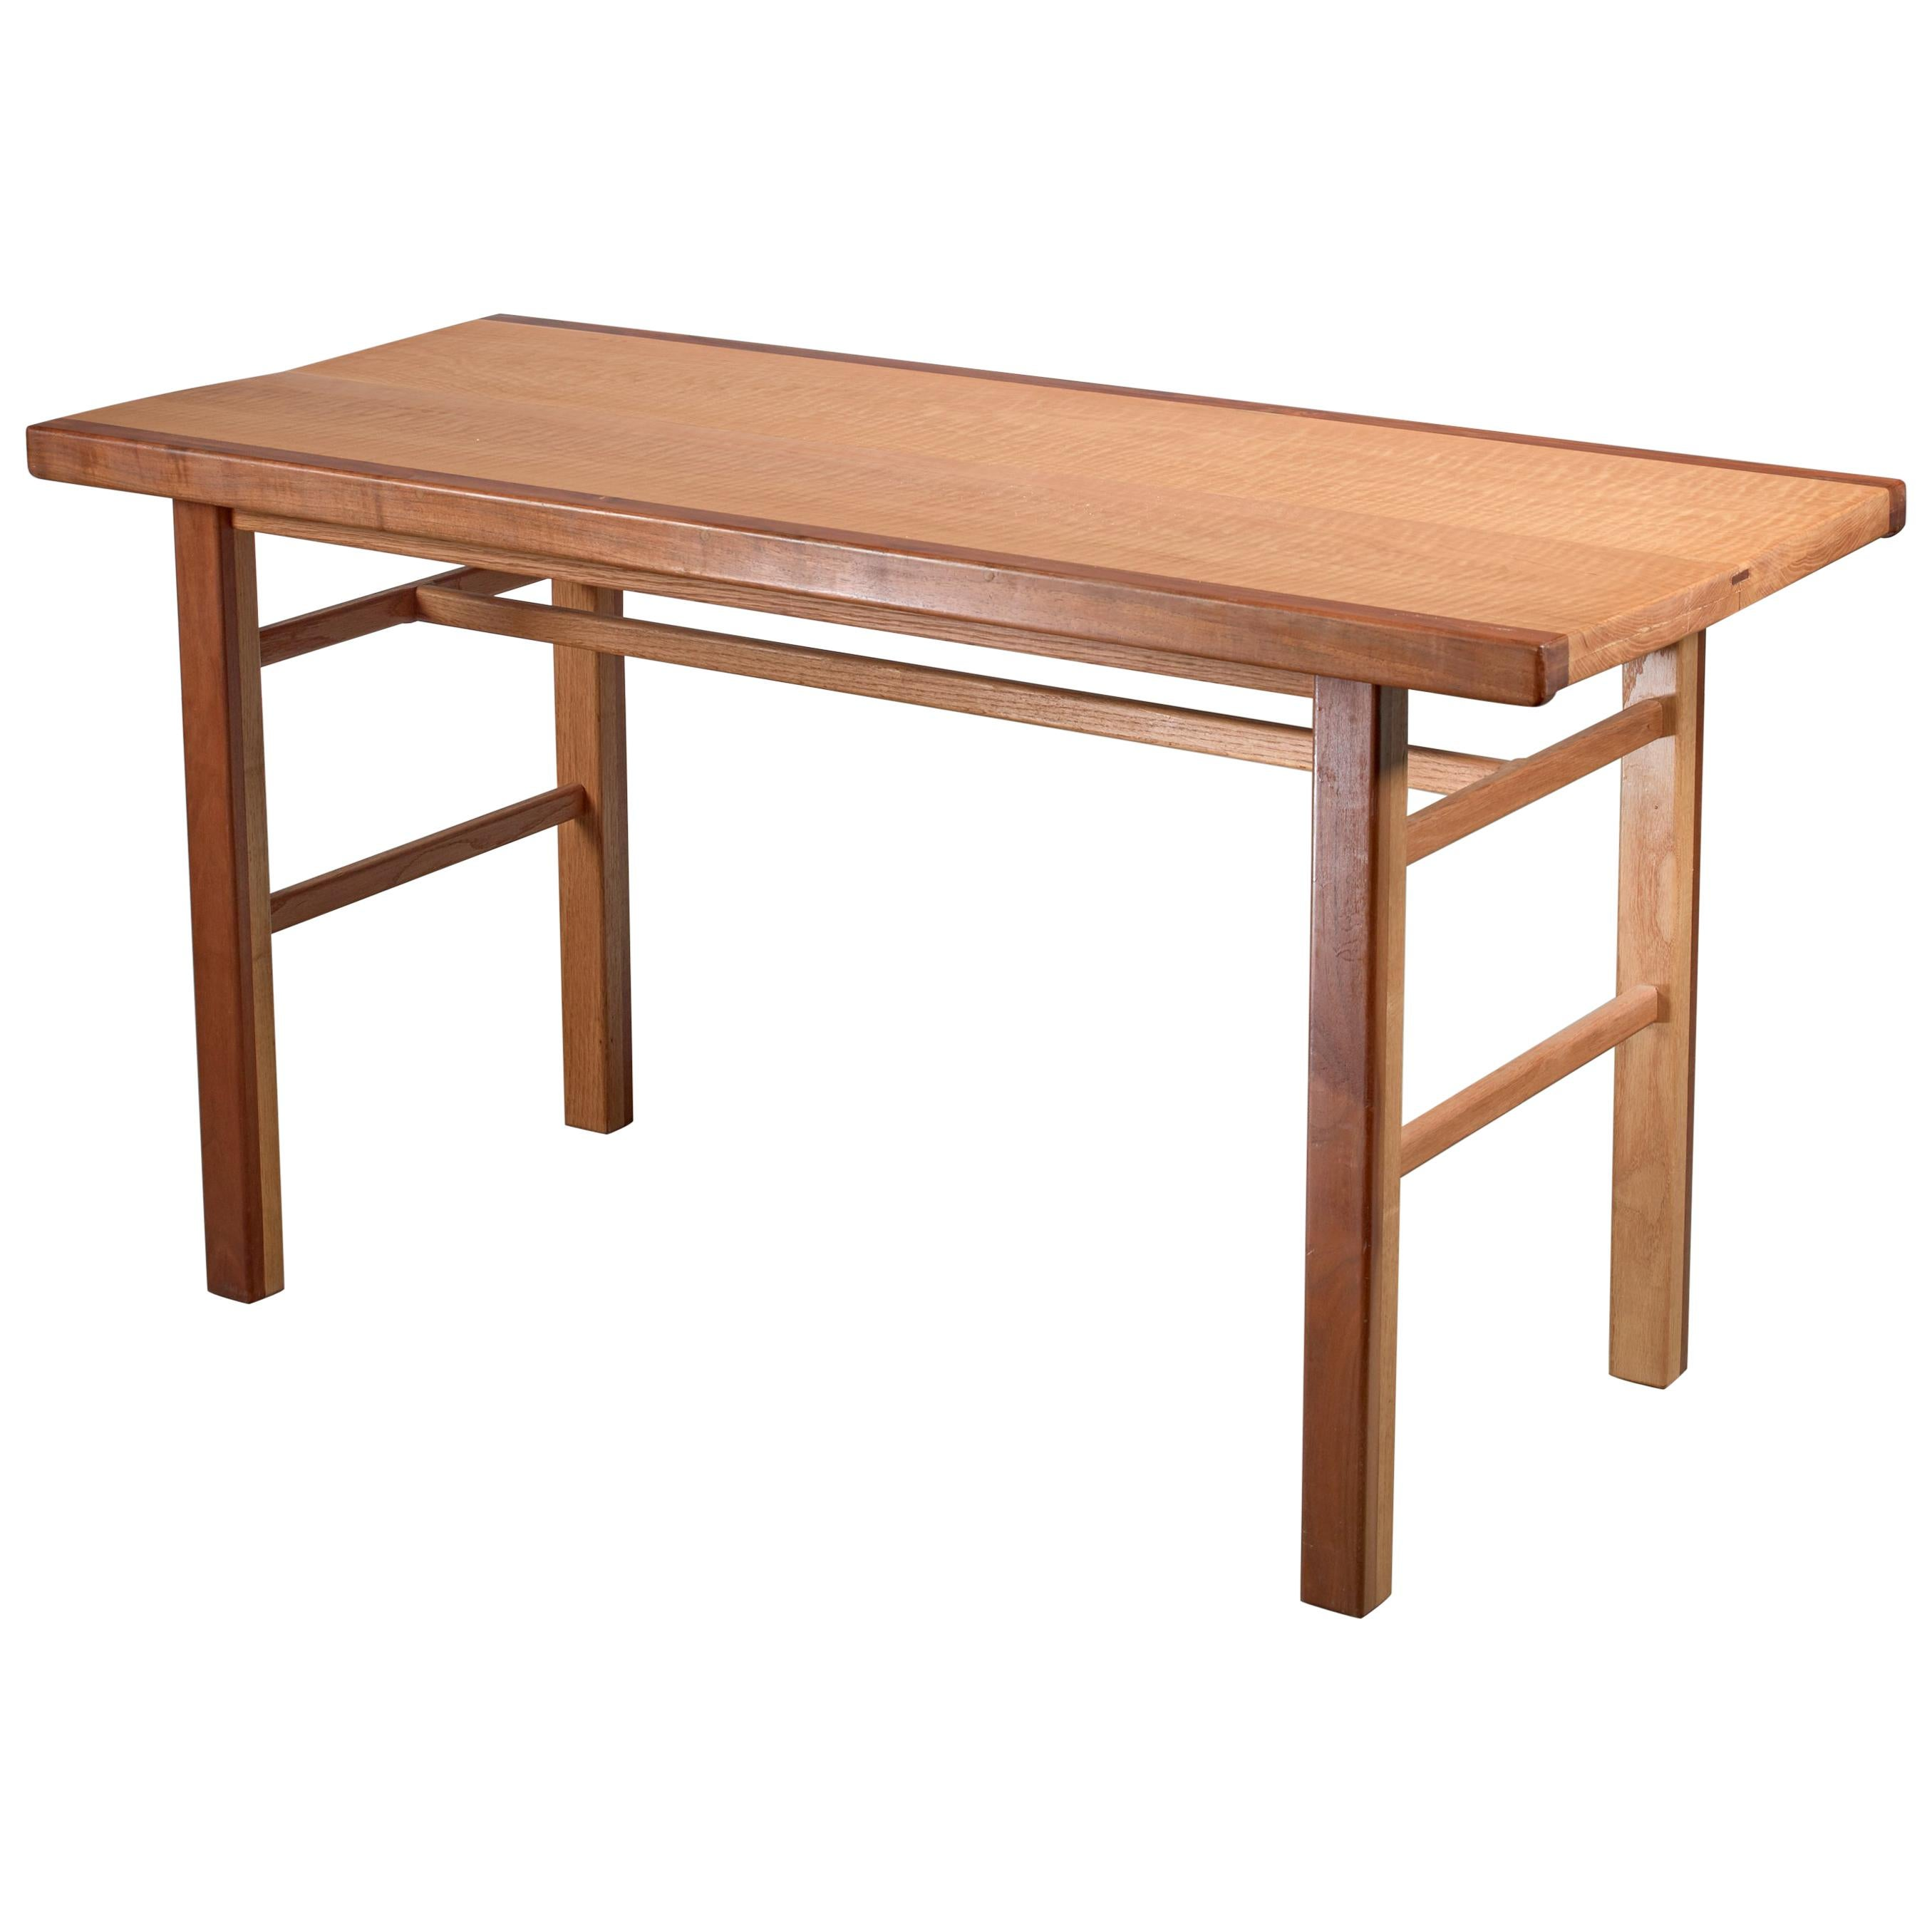 Gene Caples Walnut and Oak console Table, USA, 1960s